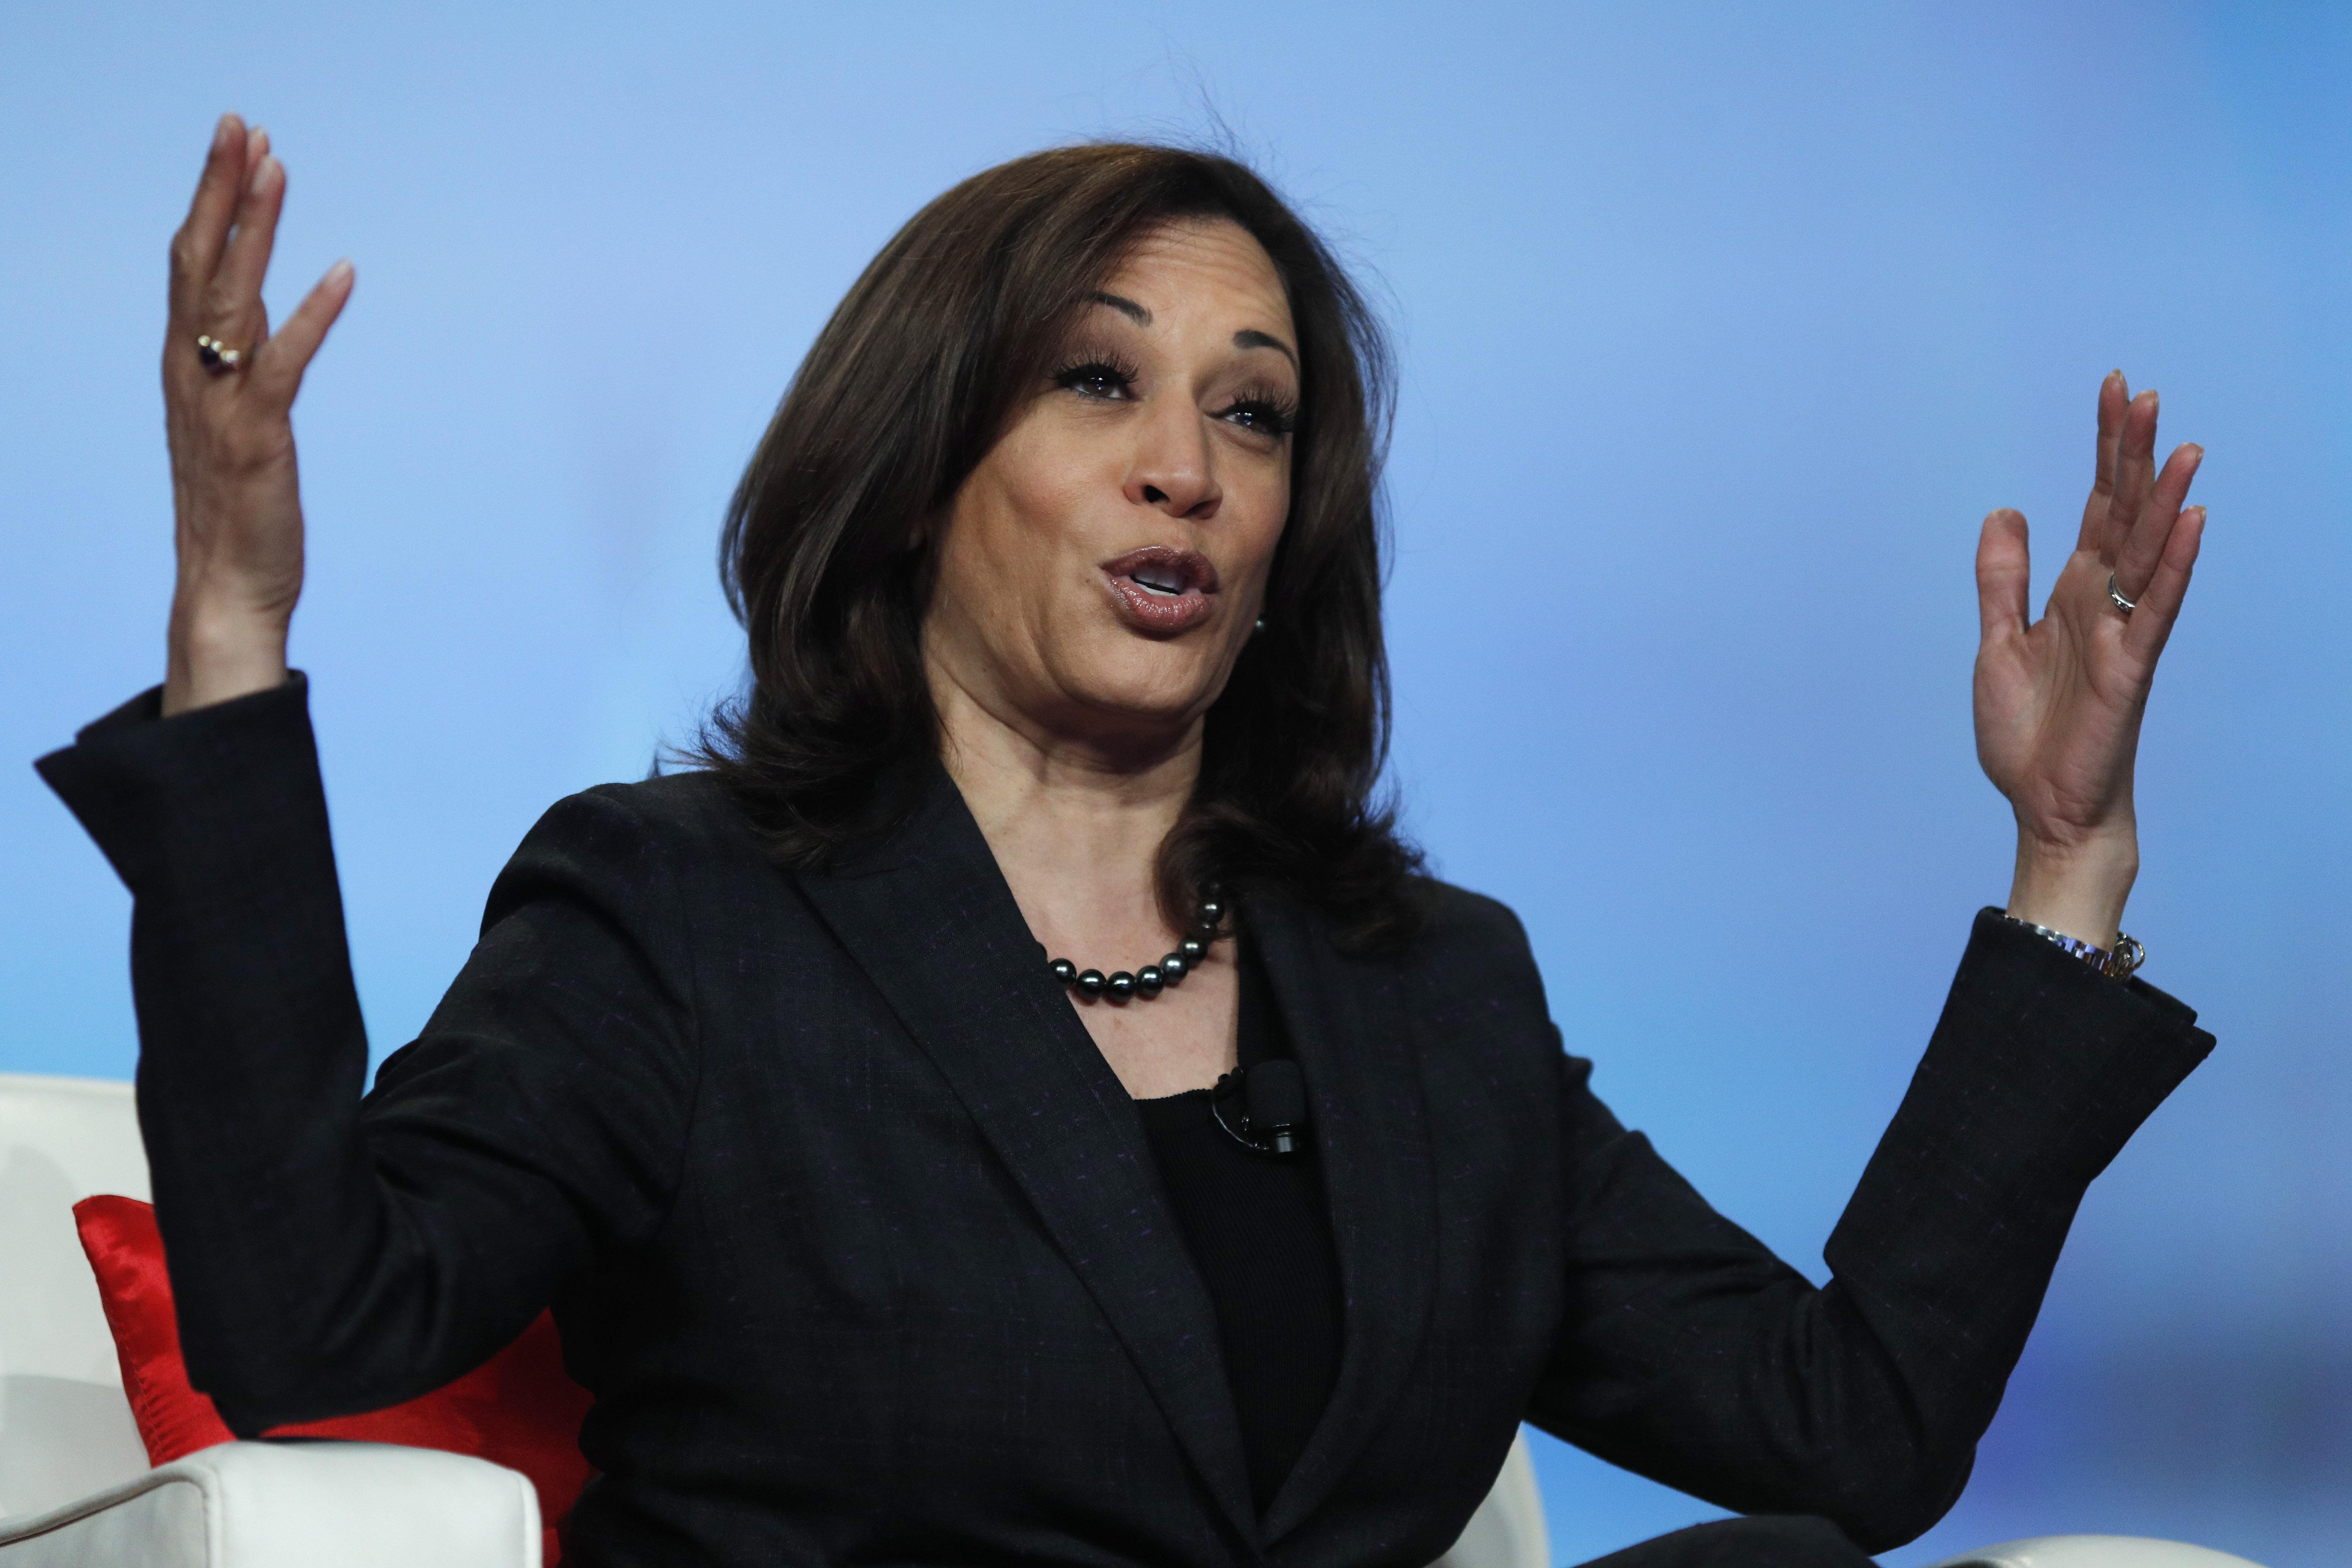 Sen. Kamala Harris, D-Calif., speaks at the Black Enterprise Women of Power Summit, Friday, March 1, 2019, in Las Vegas. (AP Photo/John Locher)